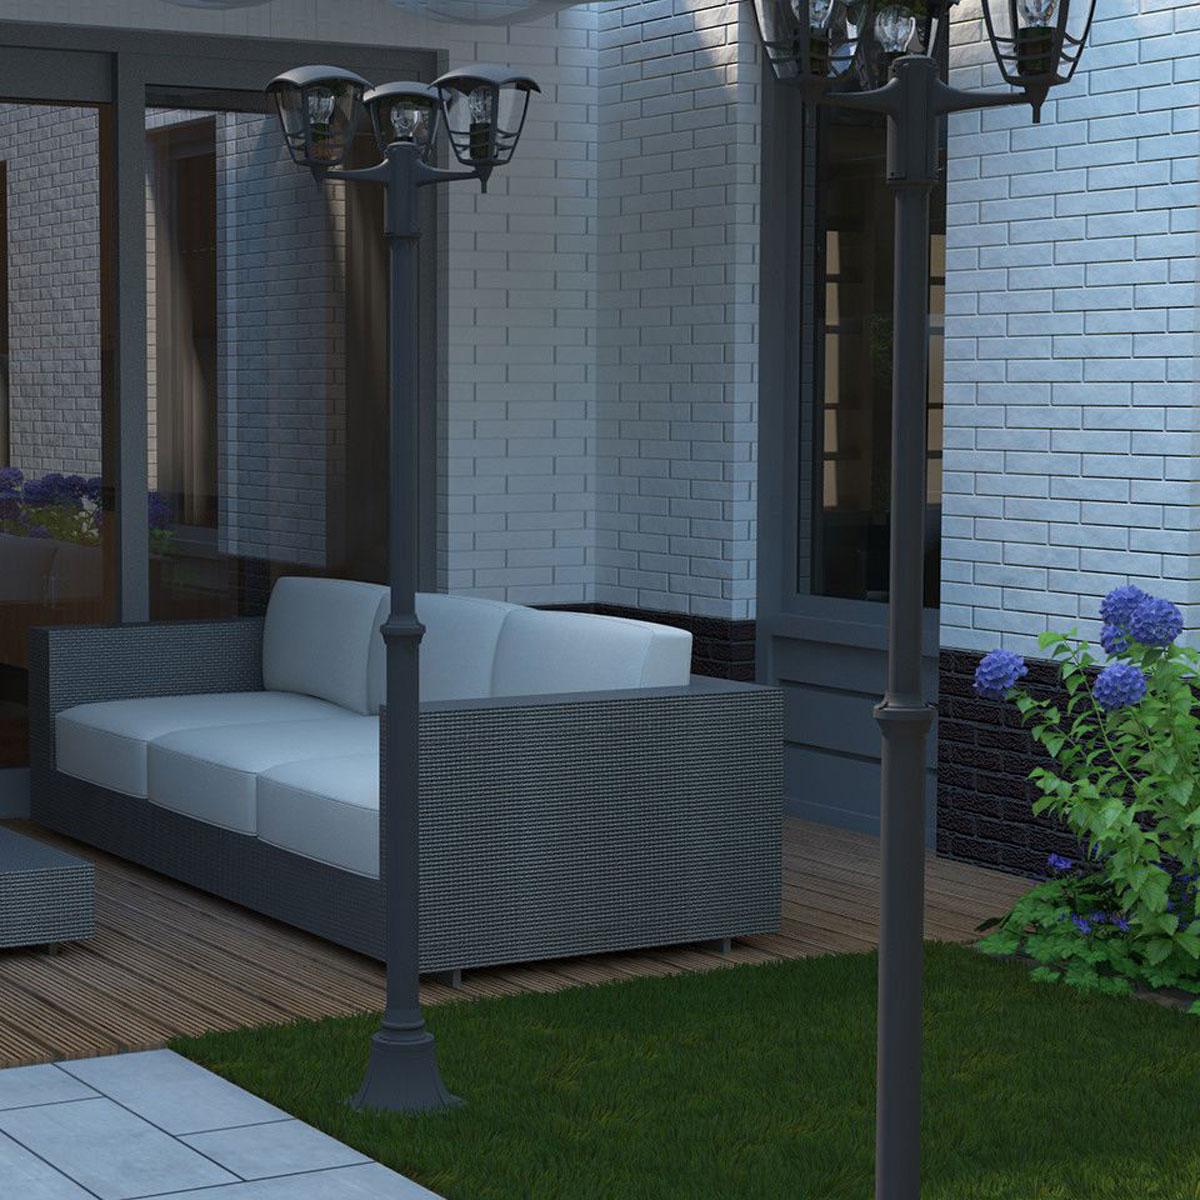 philips mygarden creek sokkel zwart 184cm. Black Bedroom Furniture Sets. Home Design Ideas